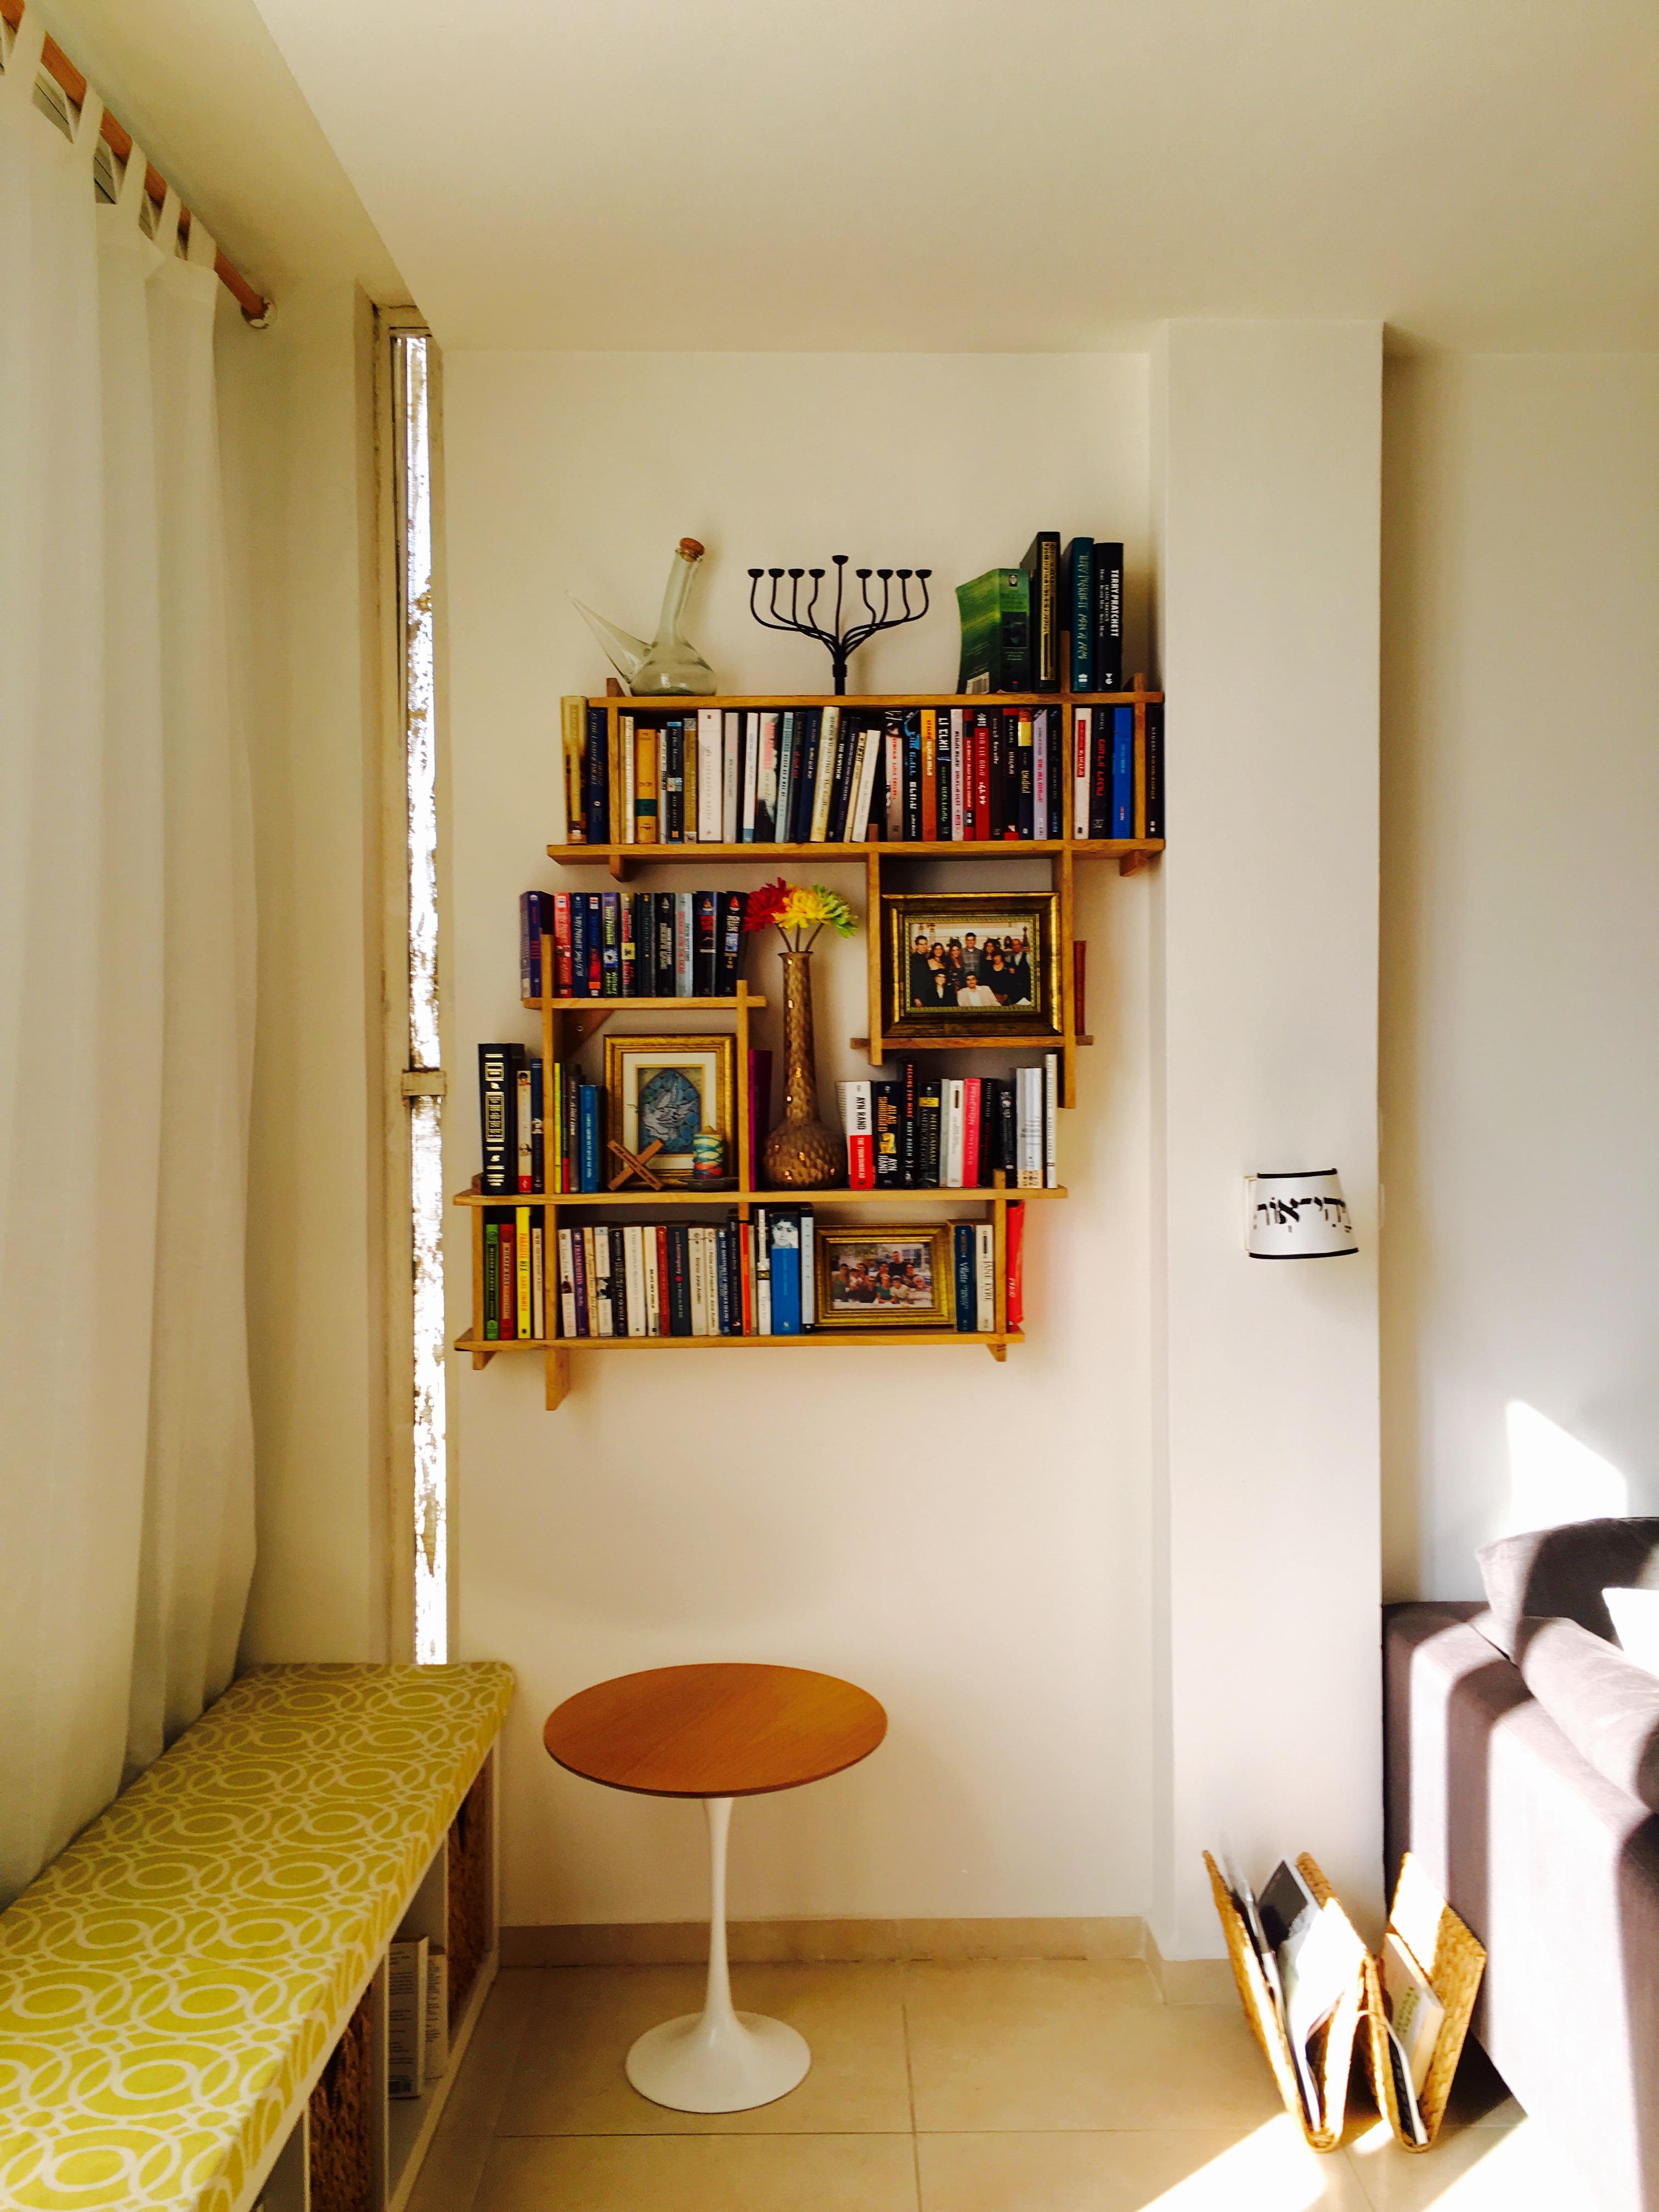 Great bookshelf display